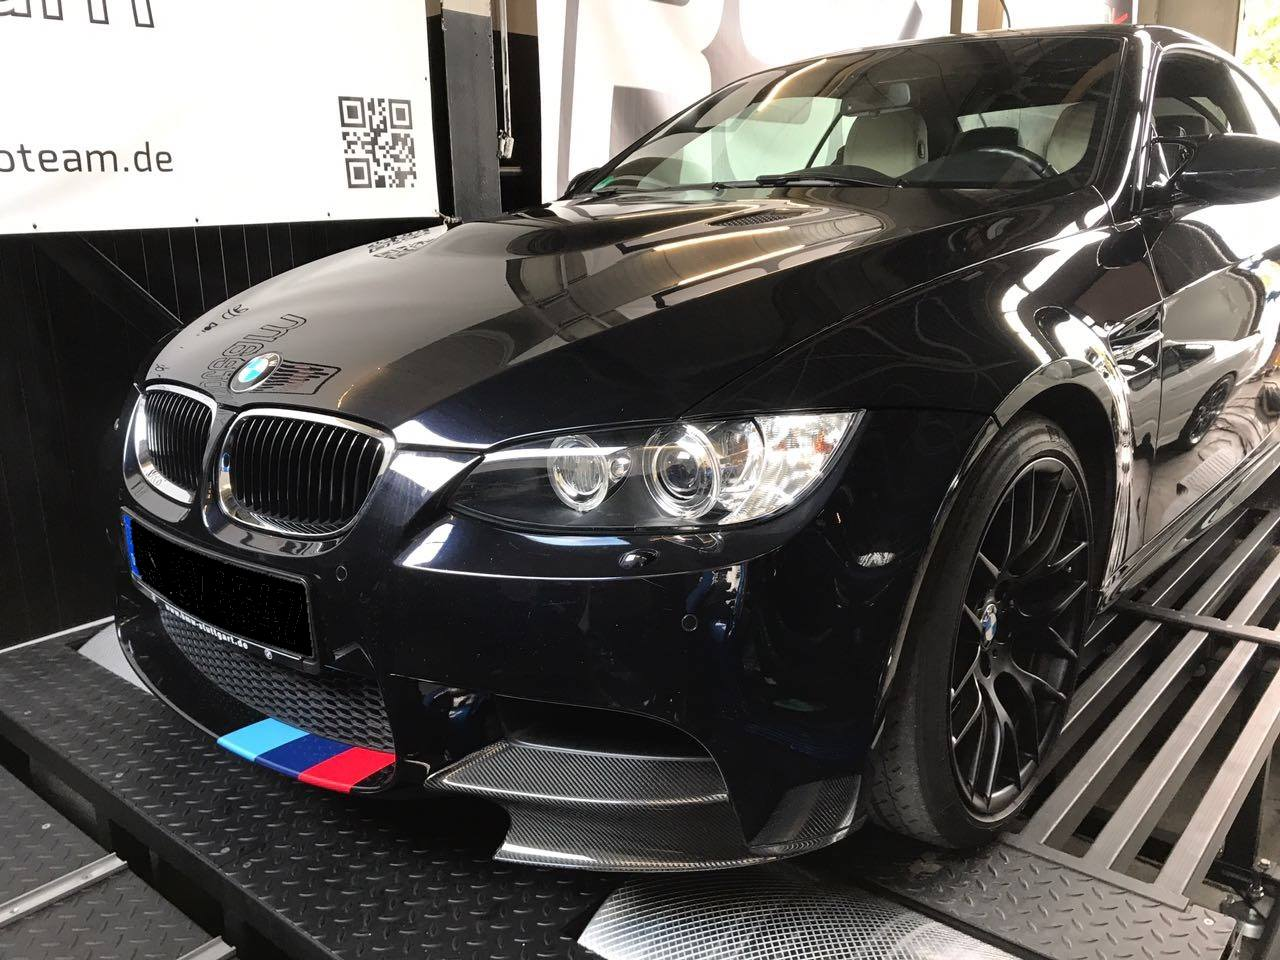 BMW RSC M3